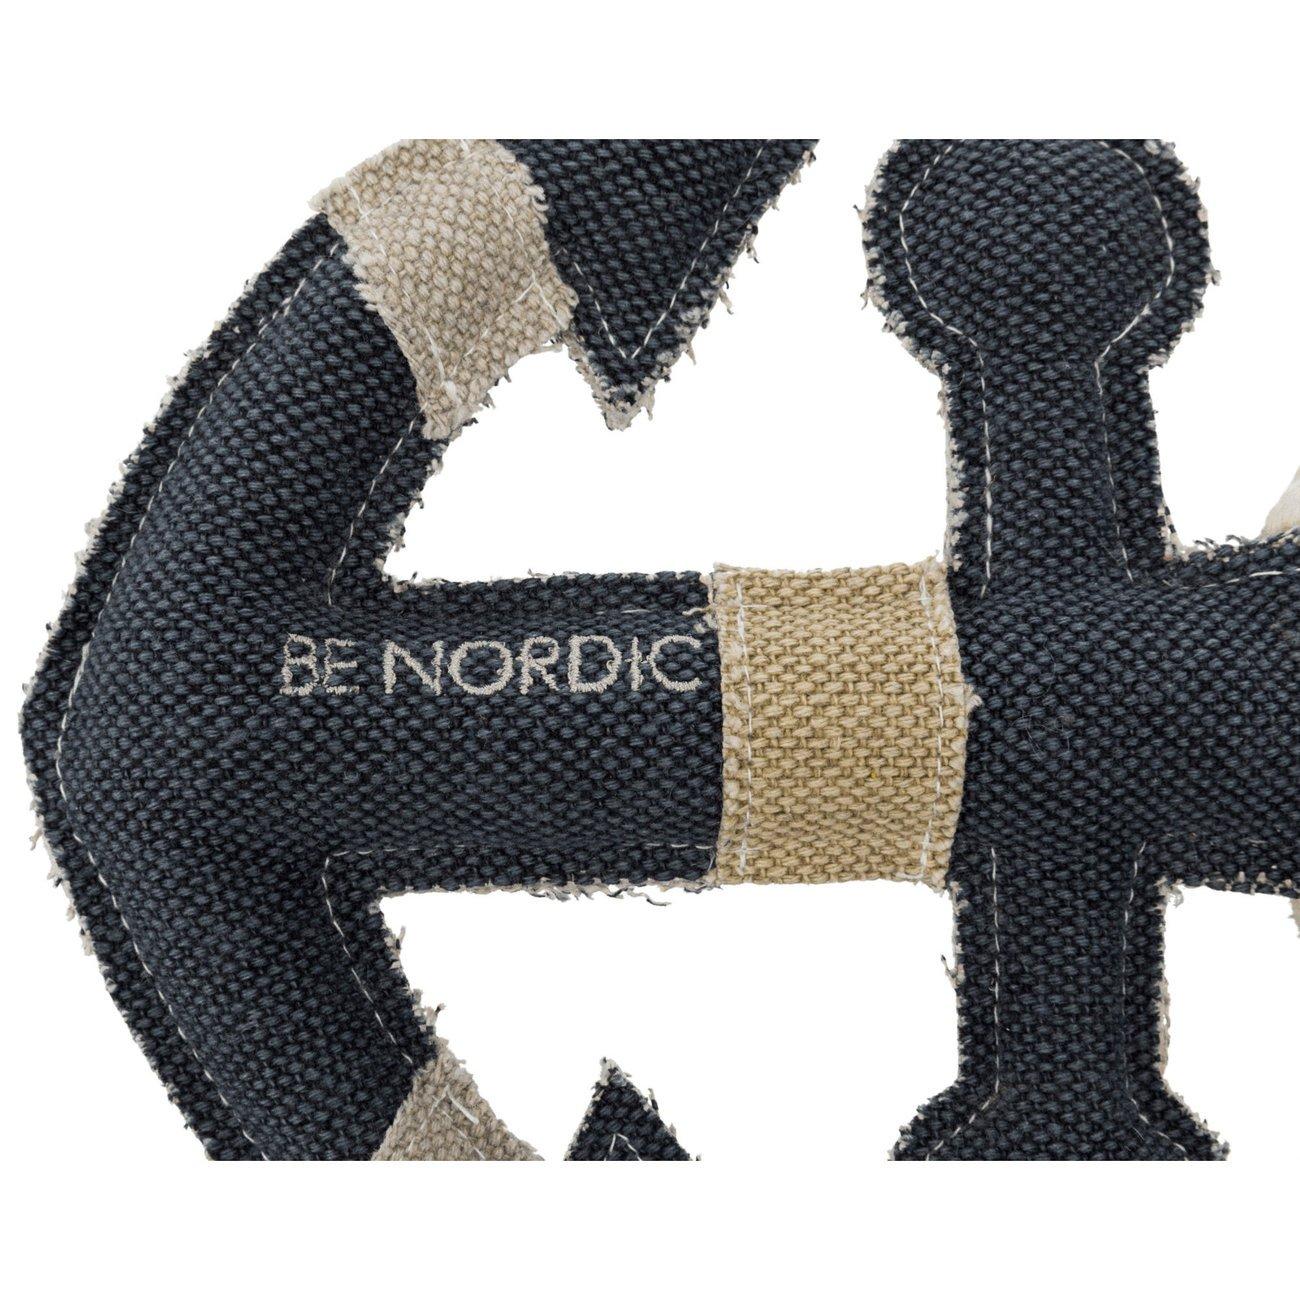 TRIXIE BE NORDIC Anker, Hundespielzeug 35651, Bild 8